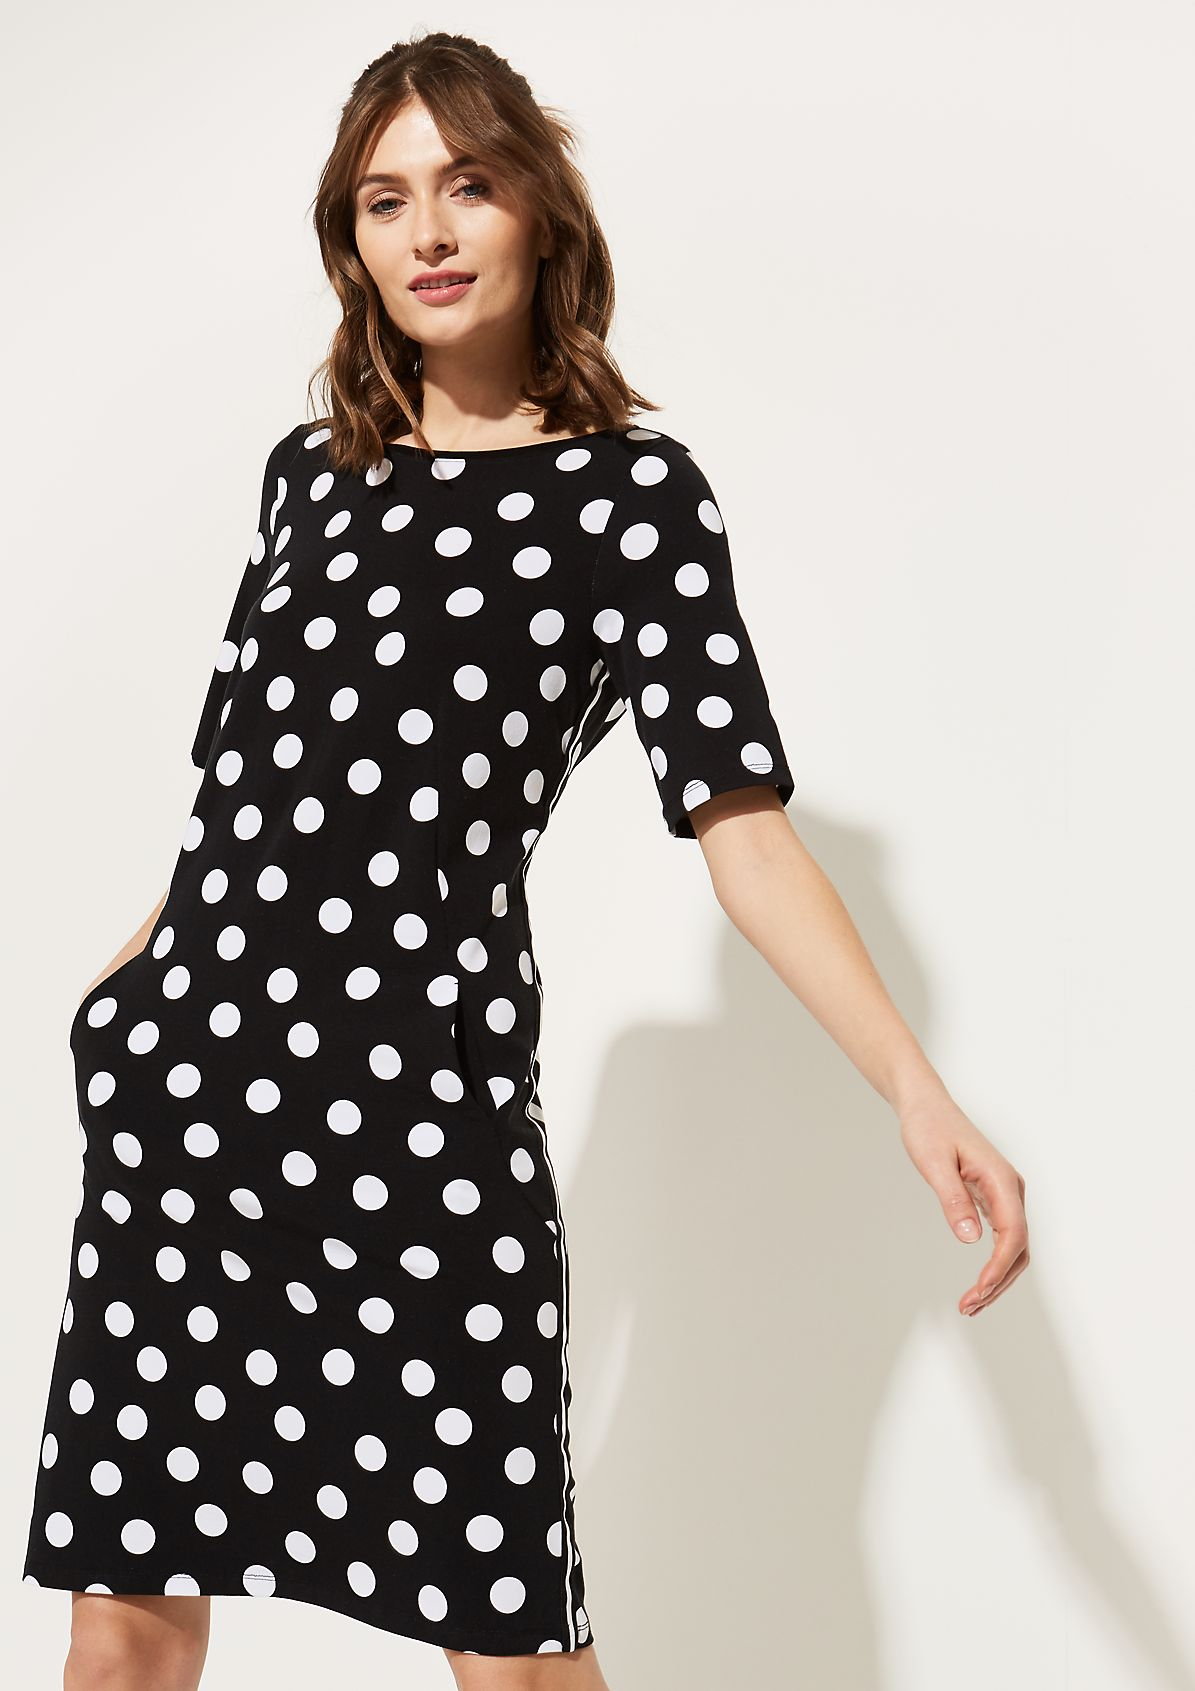 Kurzarm-Jerseykleid mit smartem Alloverprint